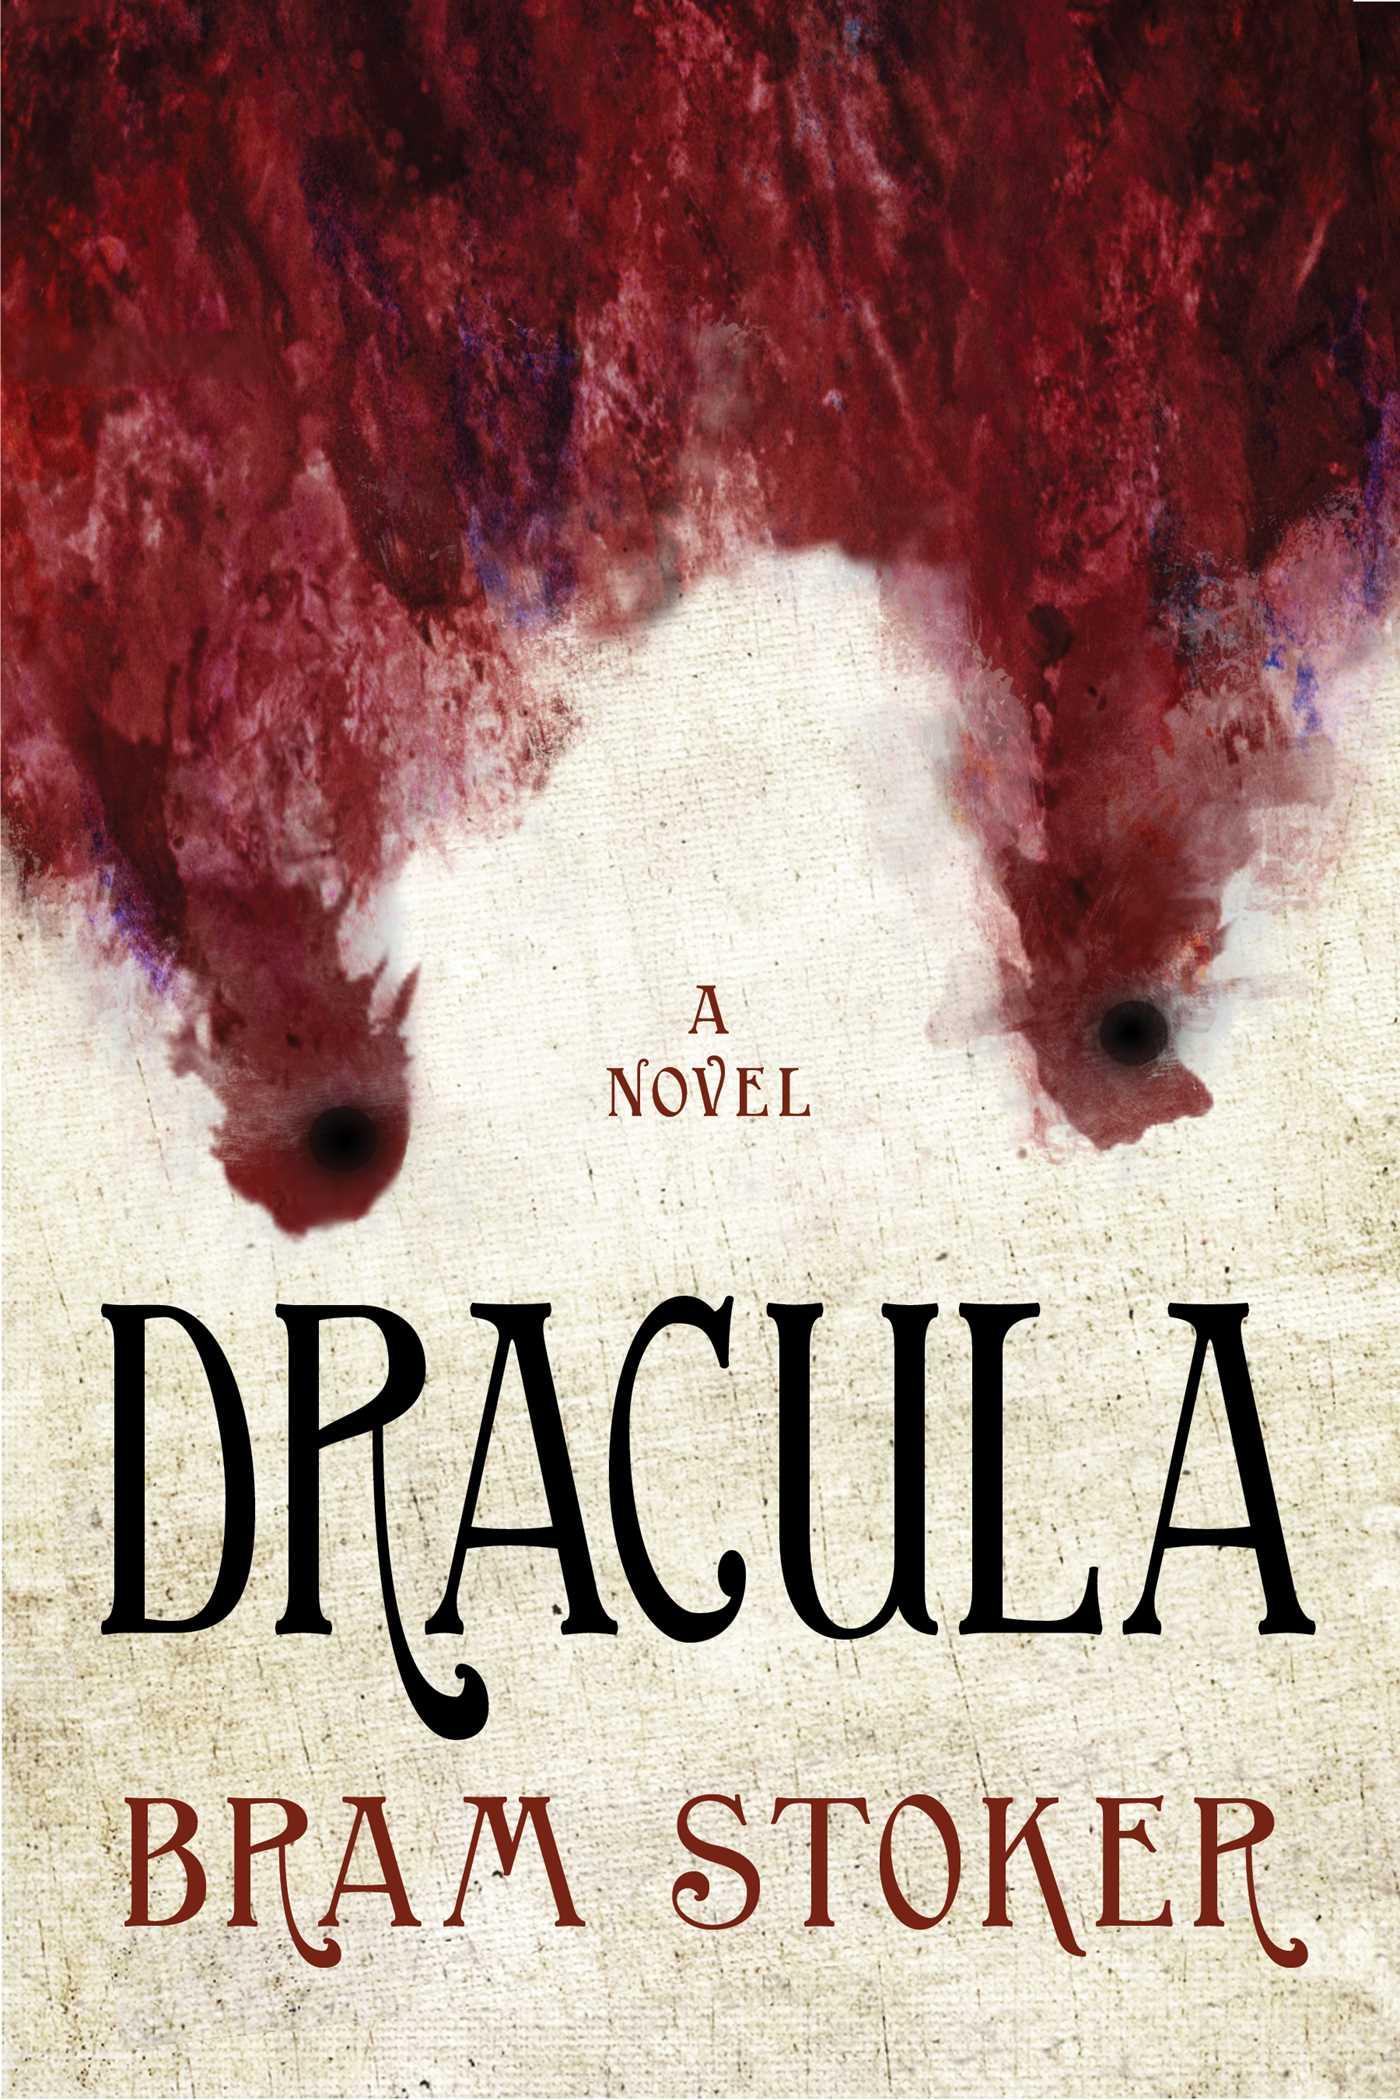 An analysis of dracula a novel by bram stoker